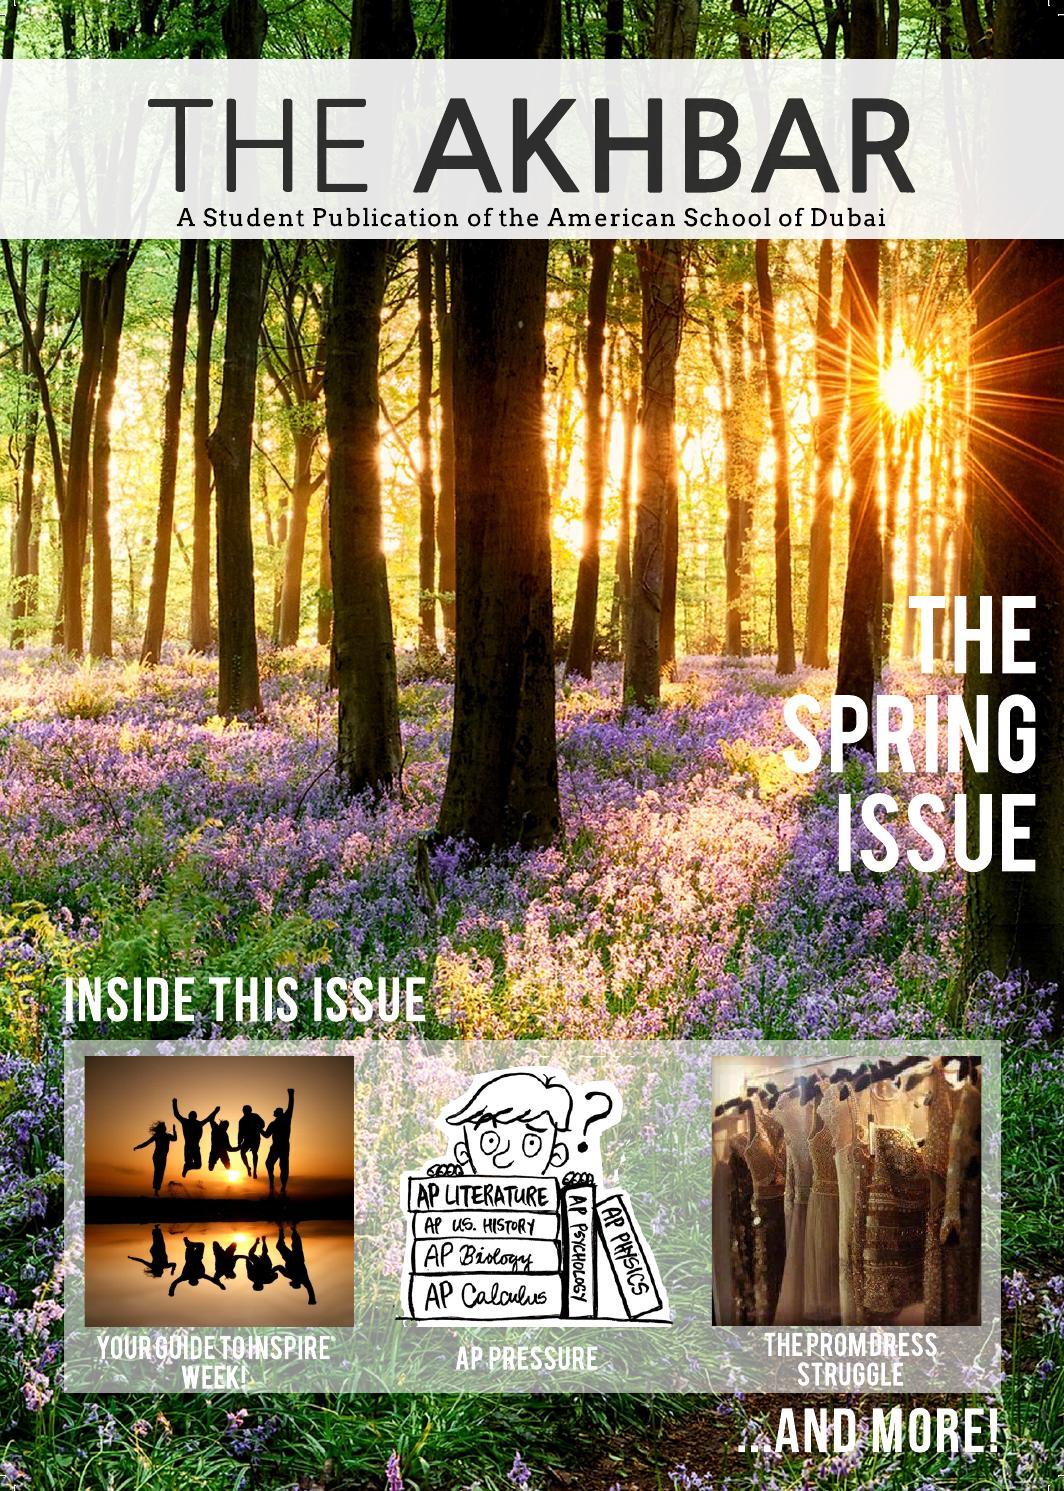 2016 the akbhar spring issue by american school of dubai   issuu